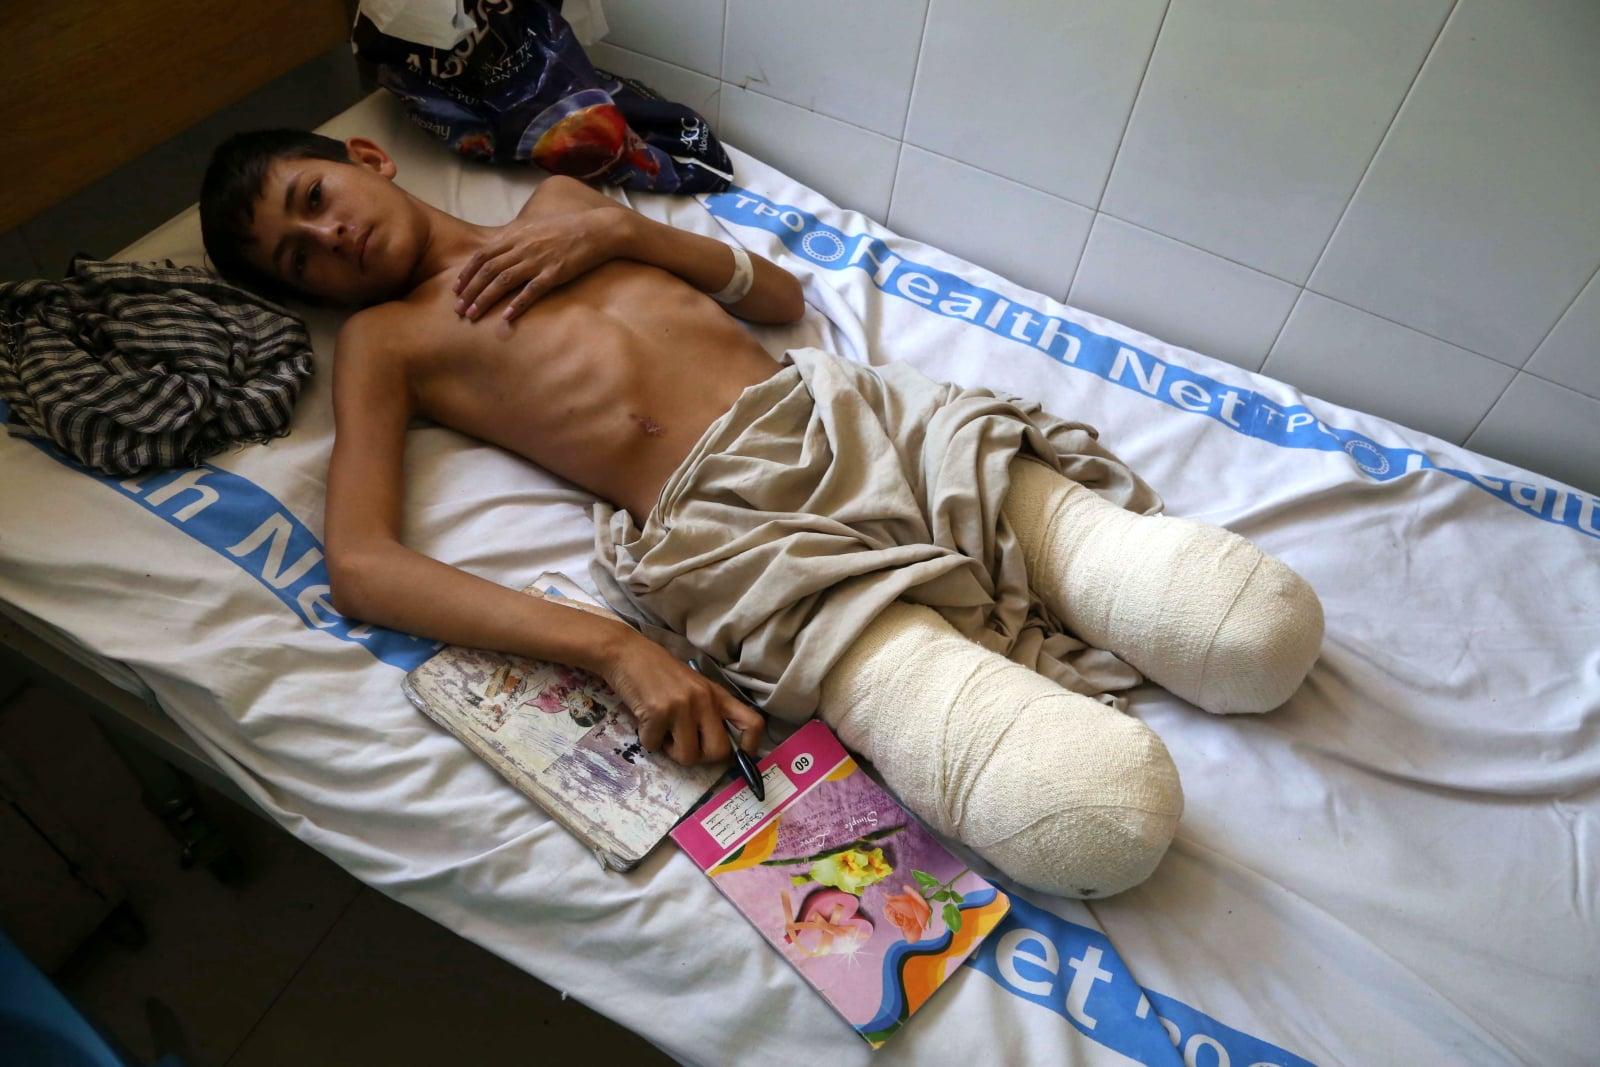 Skutki konfliktu w Afganistanie fot. EPA/GHULAMULLAH HABIBI